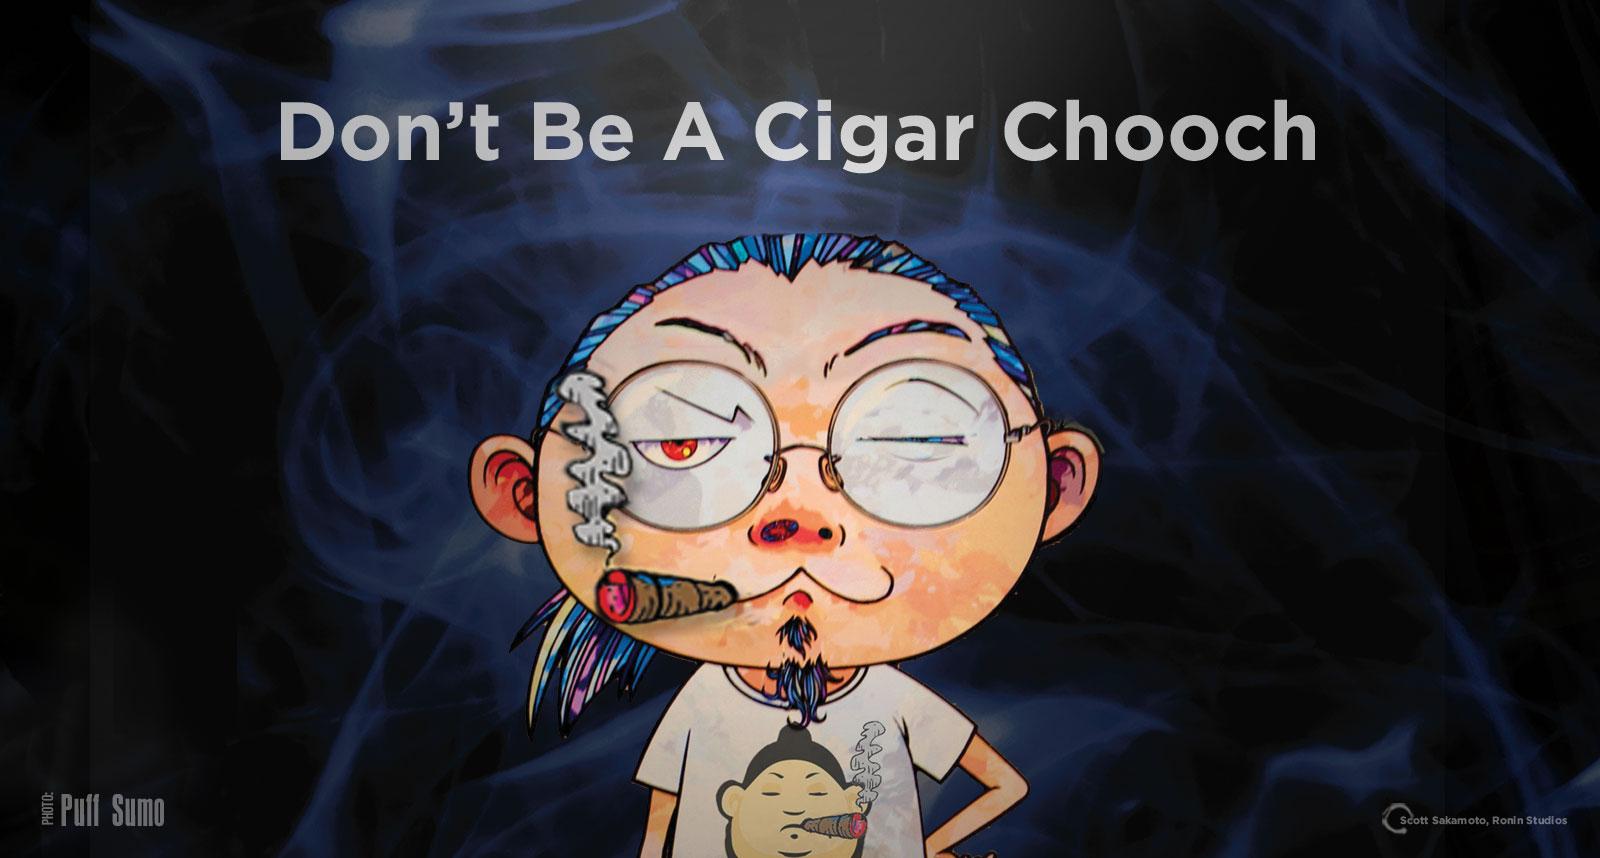 Skip Martin, RoMa Craft Tobac, Chooch, Cigar Beginners, Brian Brushwood, Jason Murphy, The Modern Rogue Show, RoMa Craft Cigars